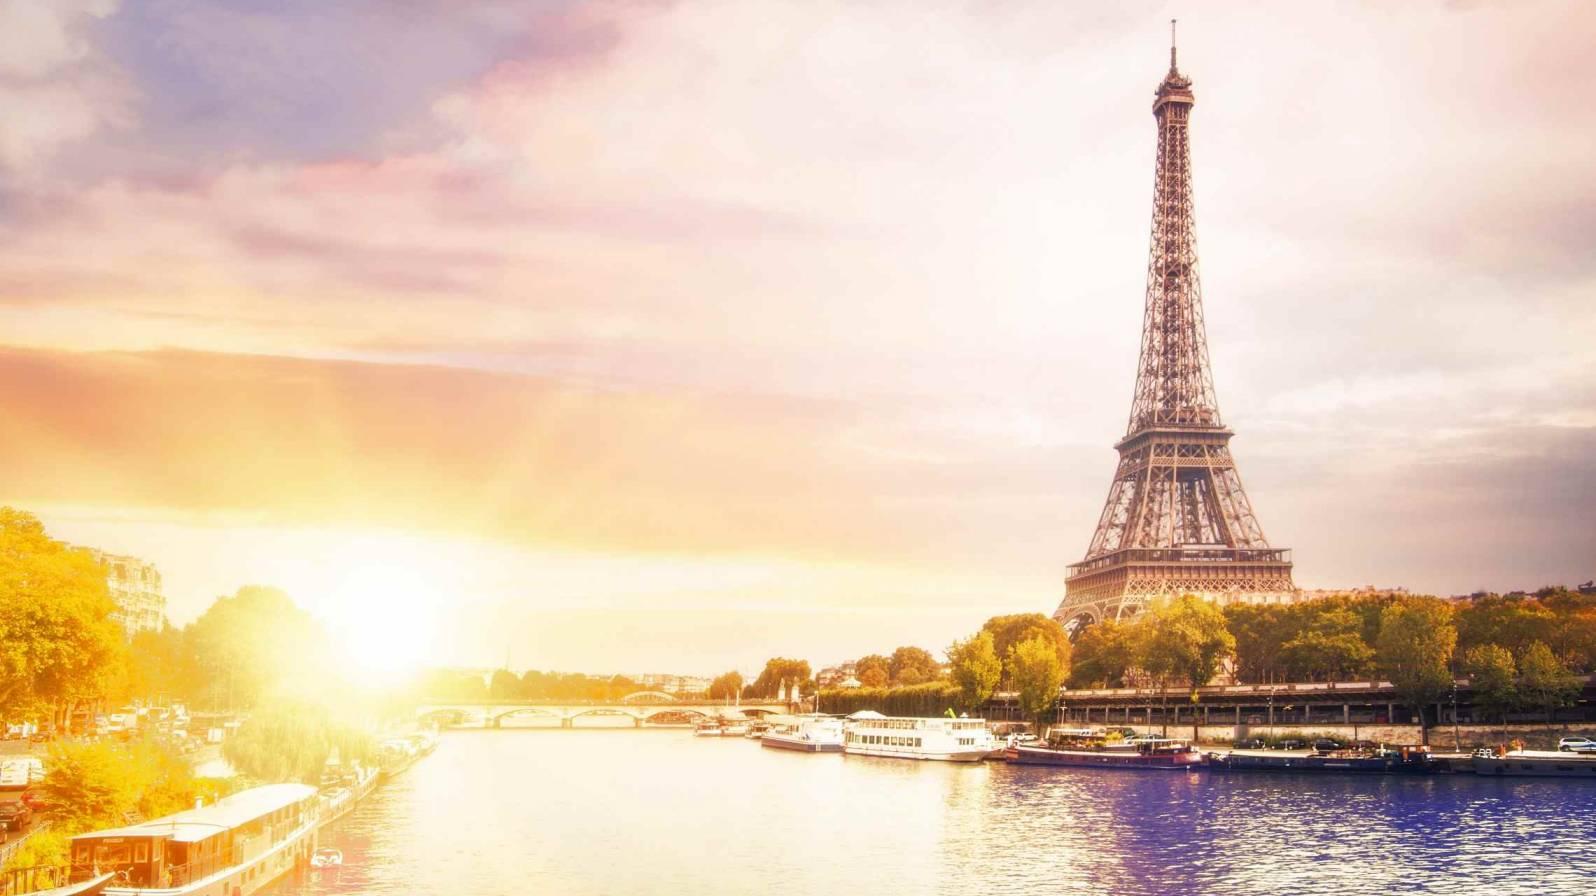 Eiffel-torni-ja-Seine-joki-Pariisi-Ranska-1596x896.jpg